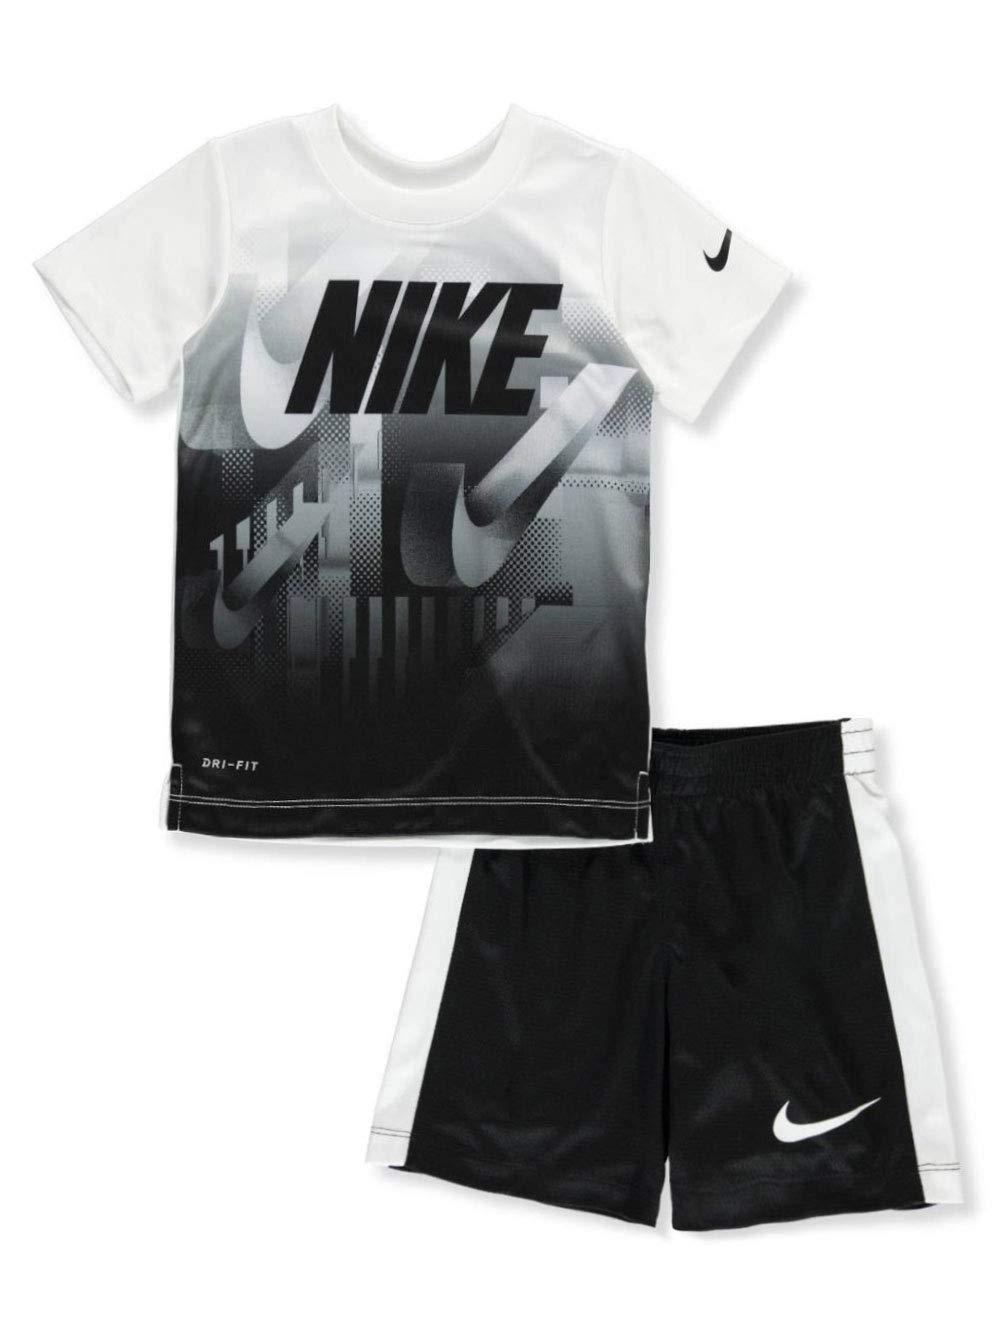 Nike Boys' 2-Piece Shorts Set Outfit - White/Black, 5